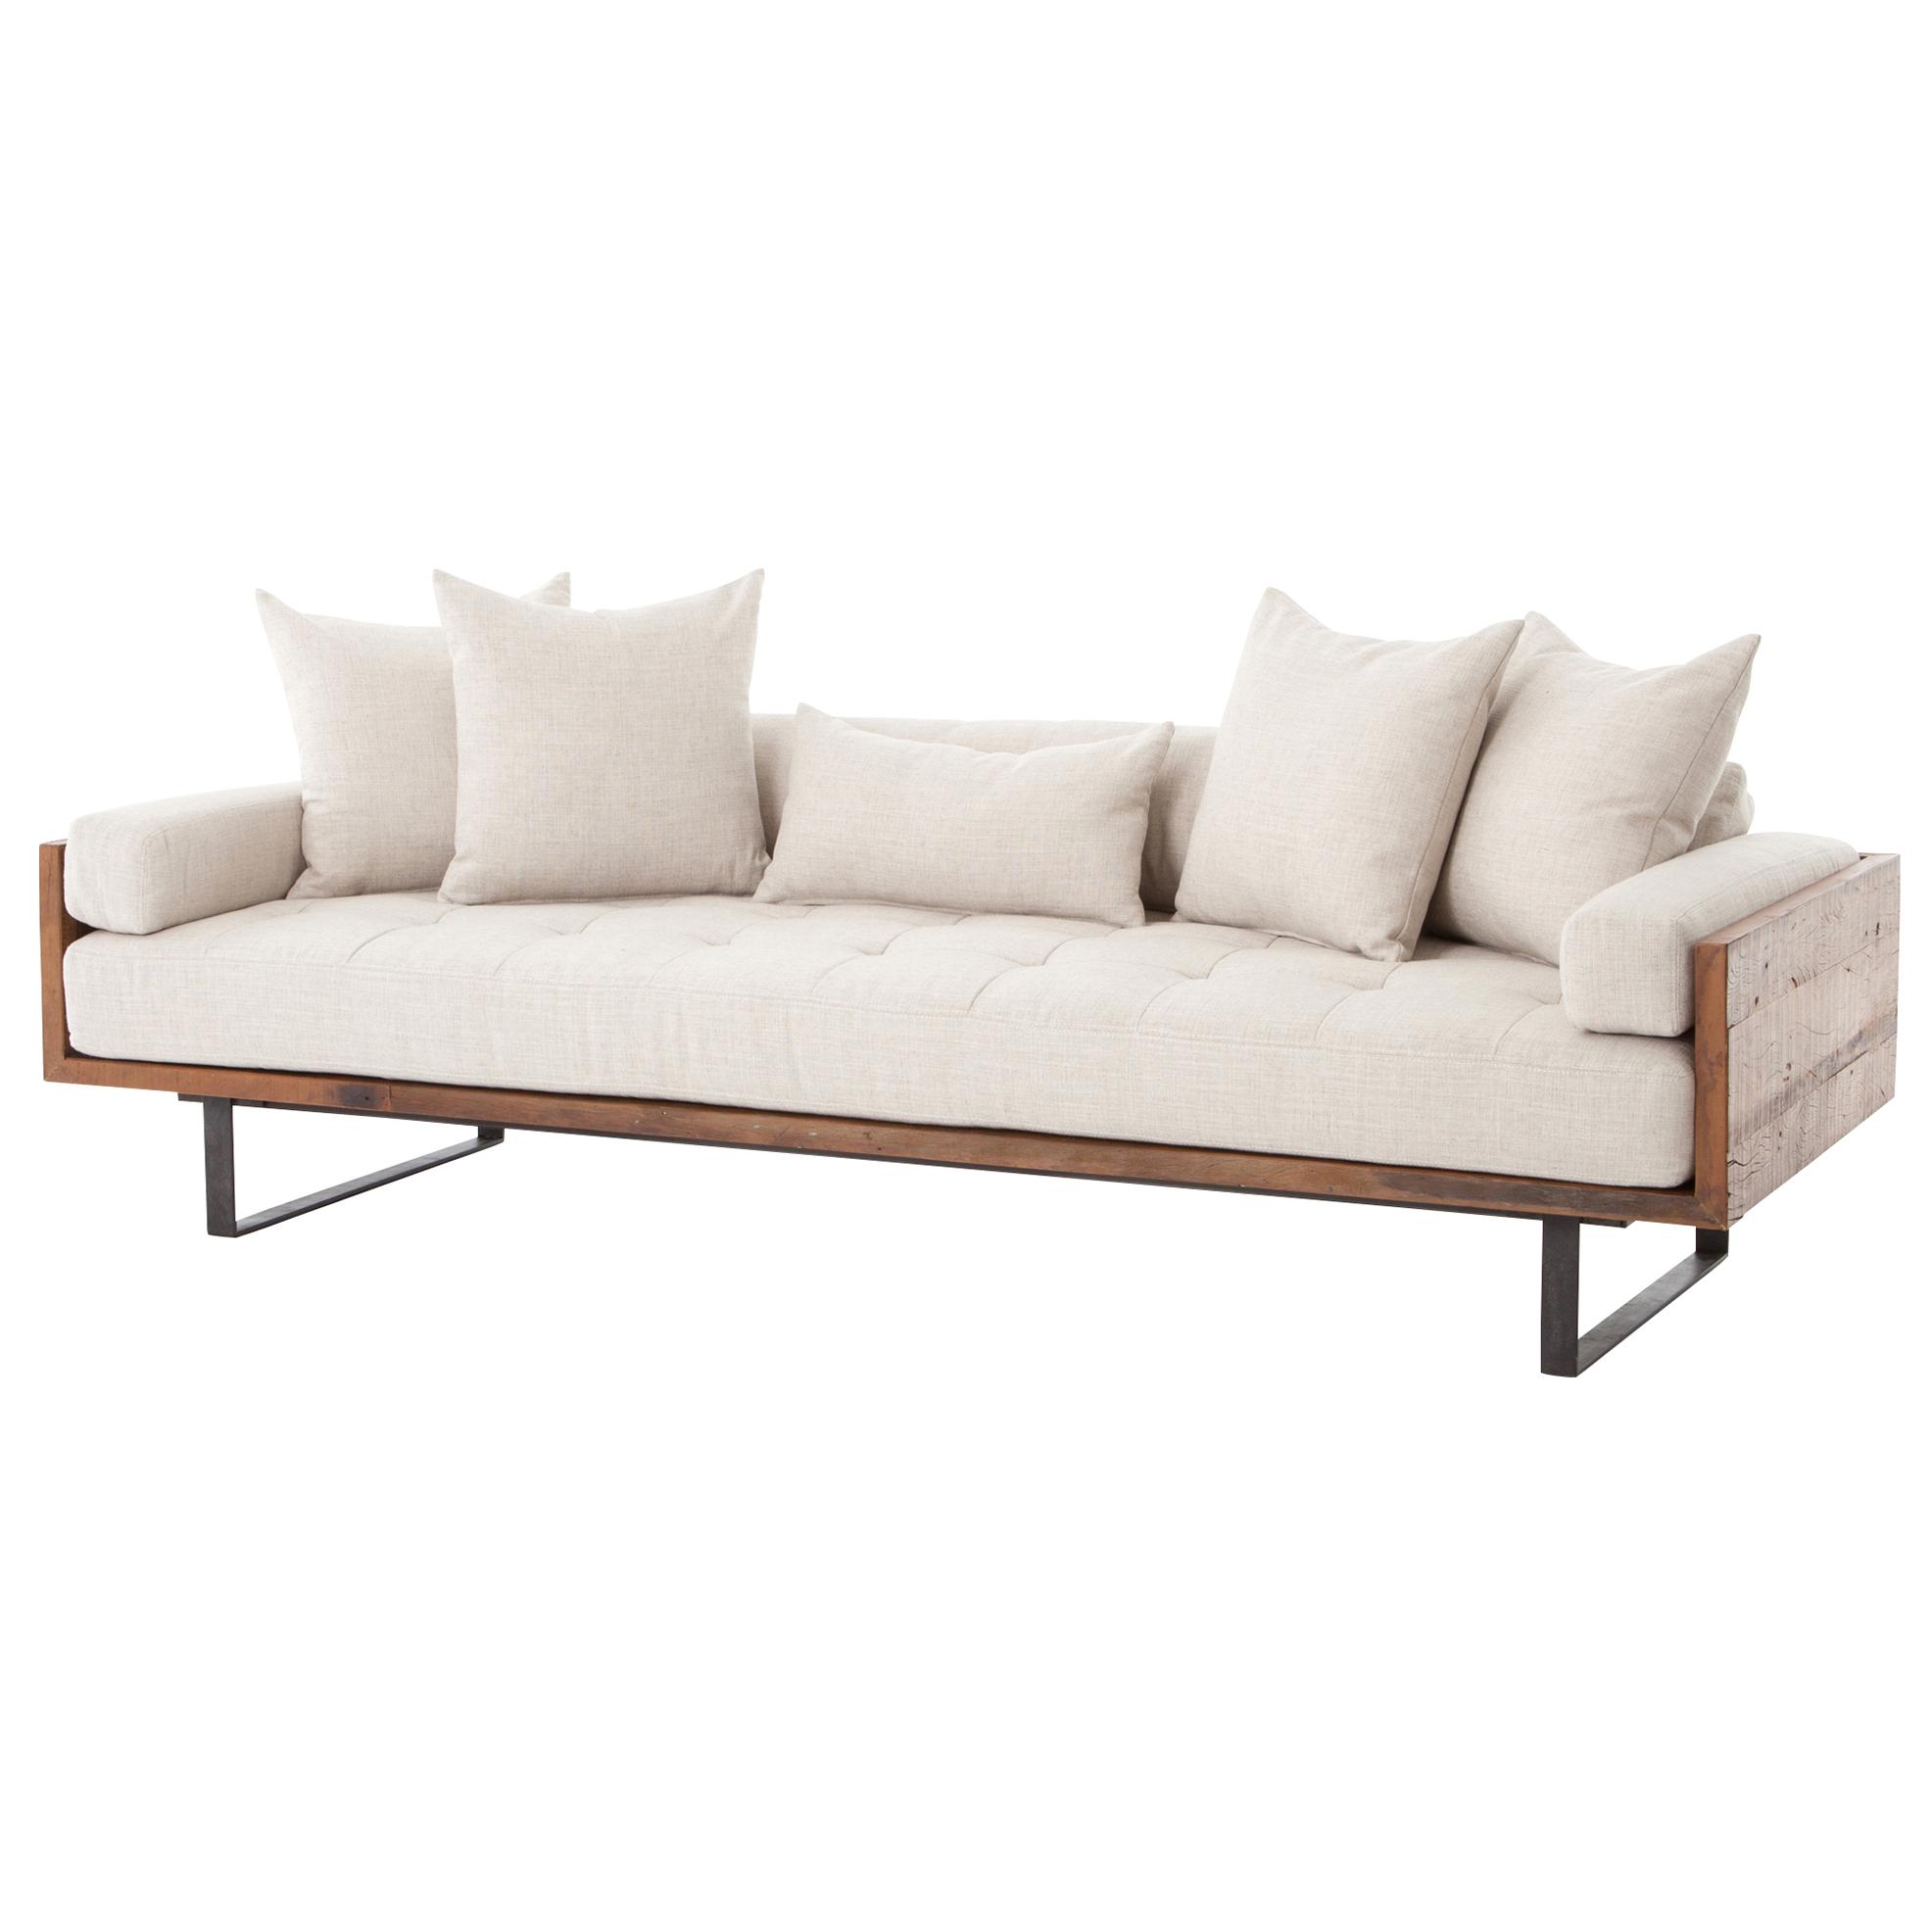 LLoyd Rustic Loft Natural Linen Exposed Wood Sofa